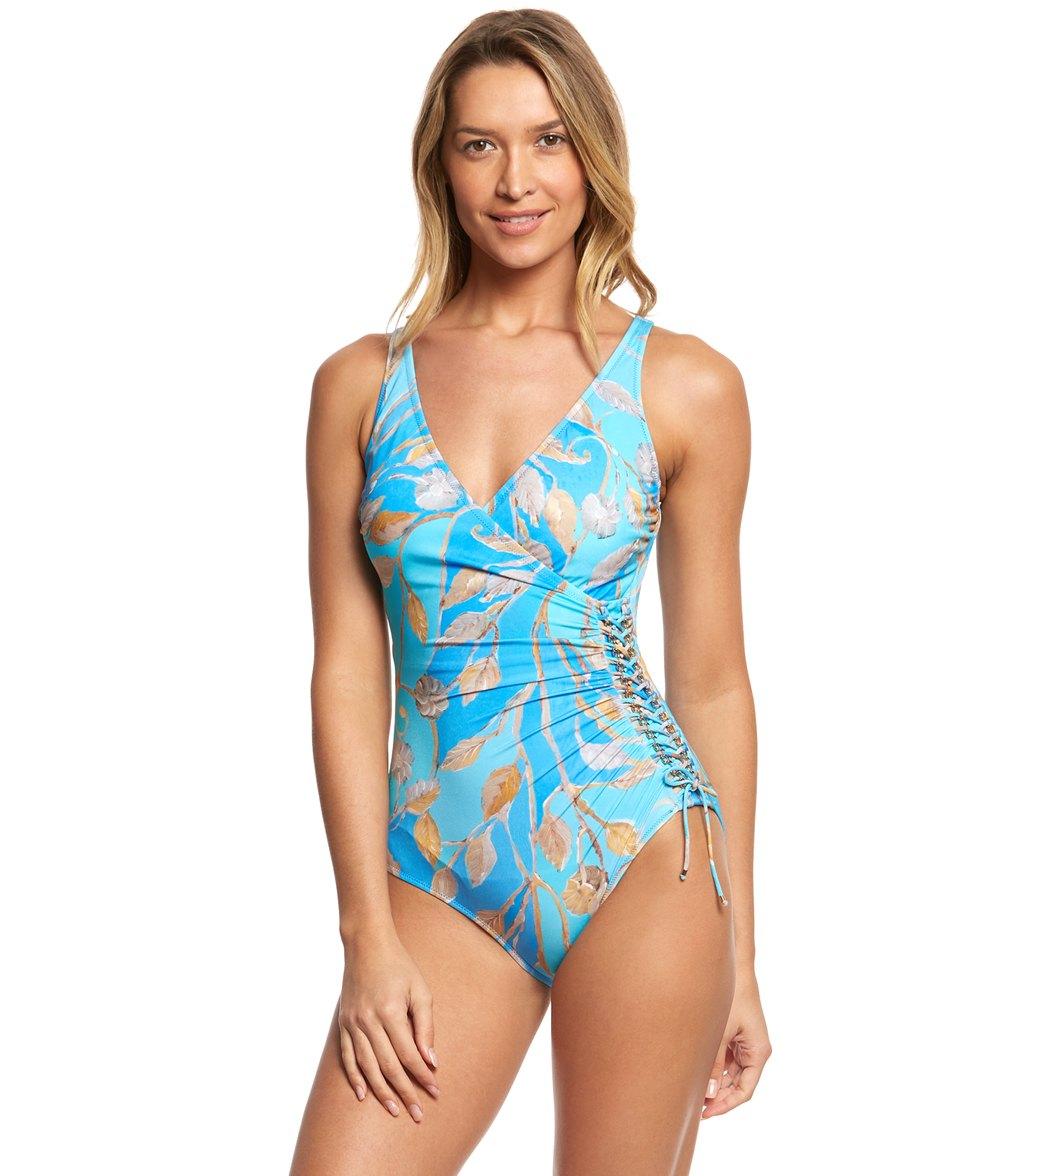 cc73c09f7efc Gottex Capri Surplice One Piece Swimsuit at SwimOutlet.com - Free ...